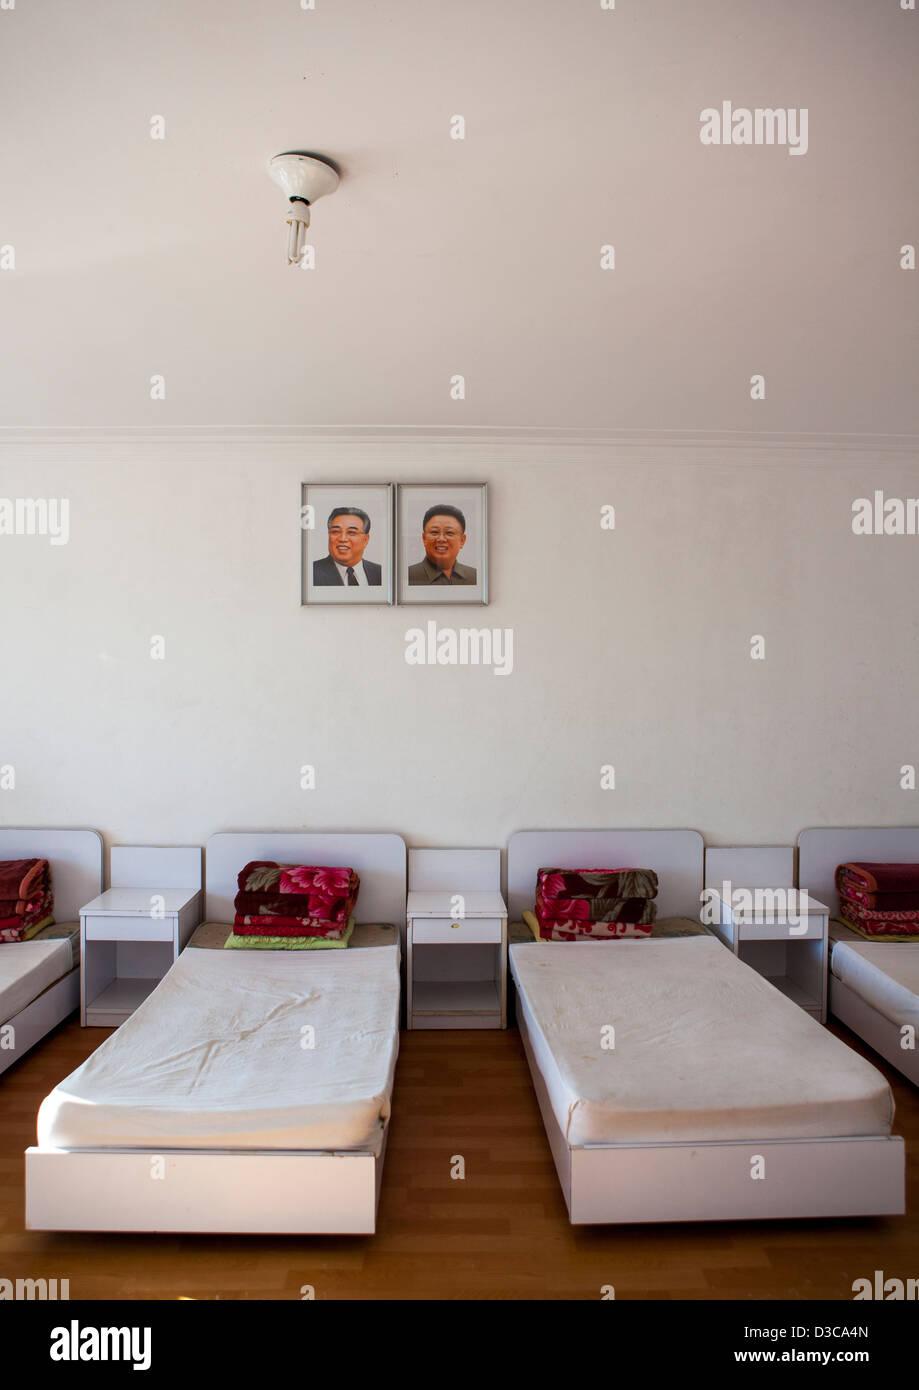 Bedroom In Songdowon International Children's Camp, Wonsan, North Korea, North Korea Stock Photo